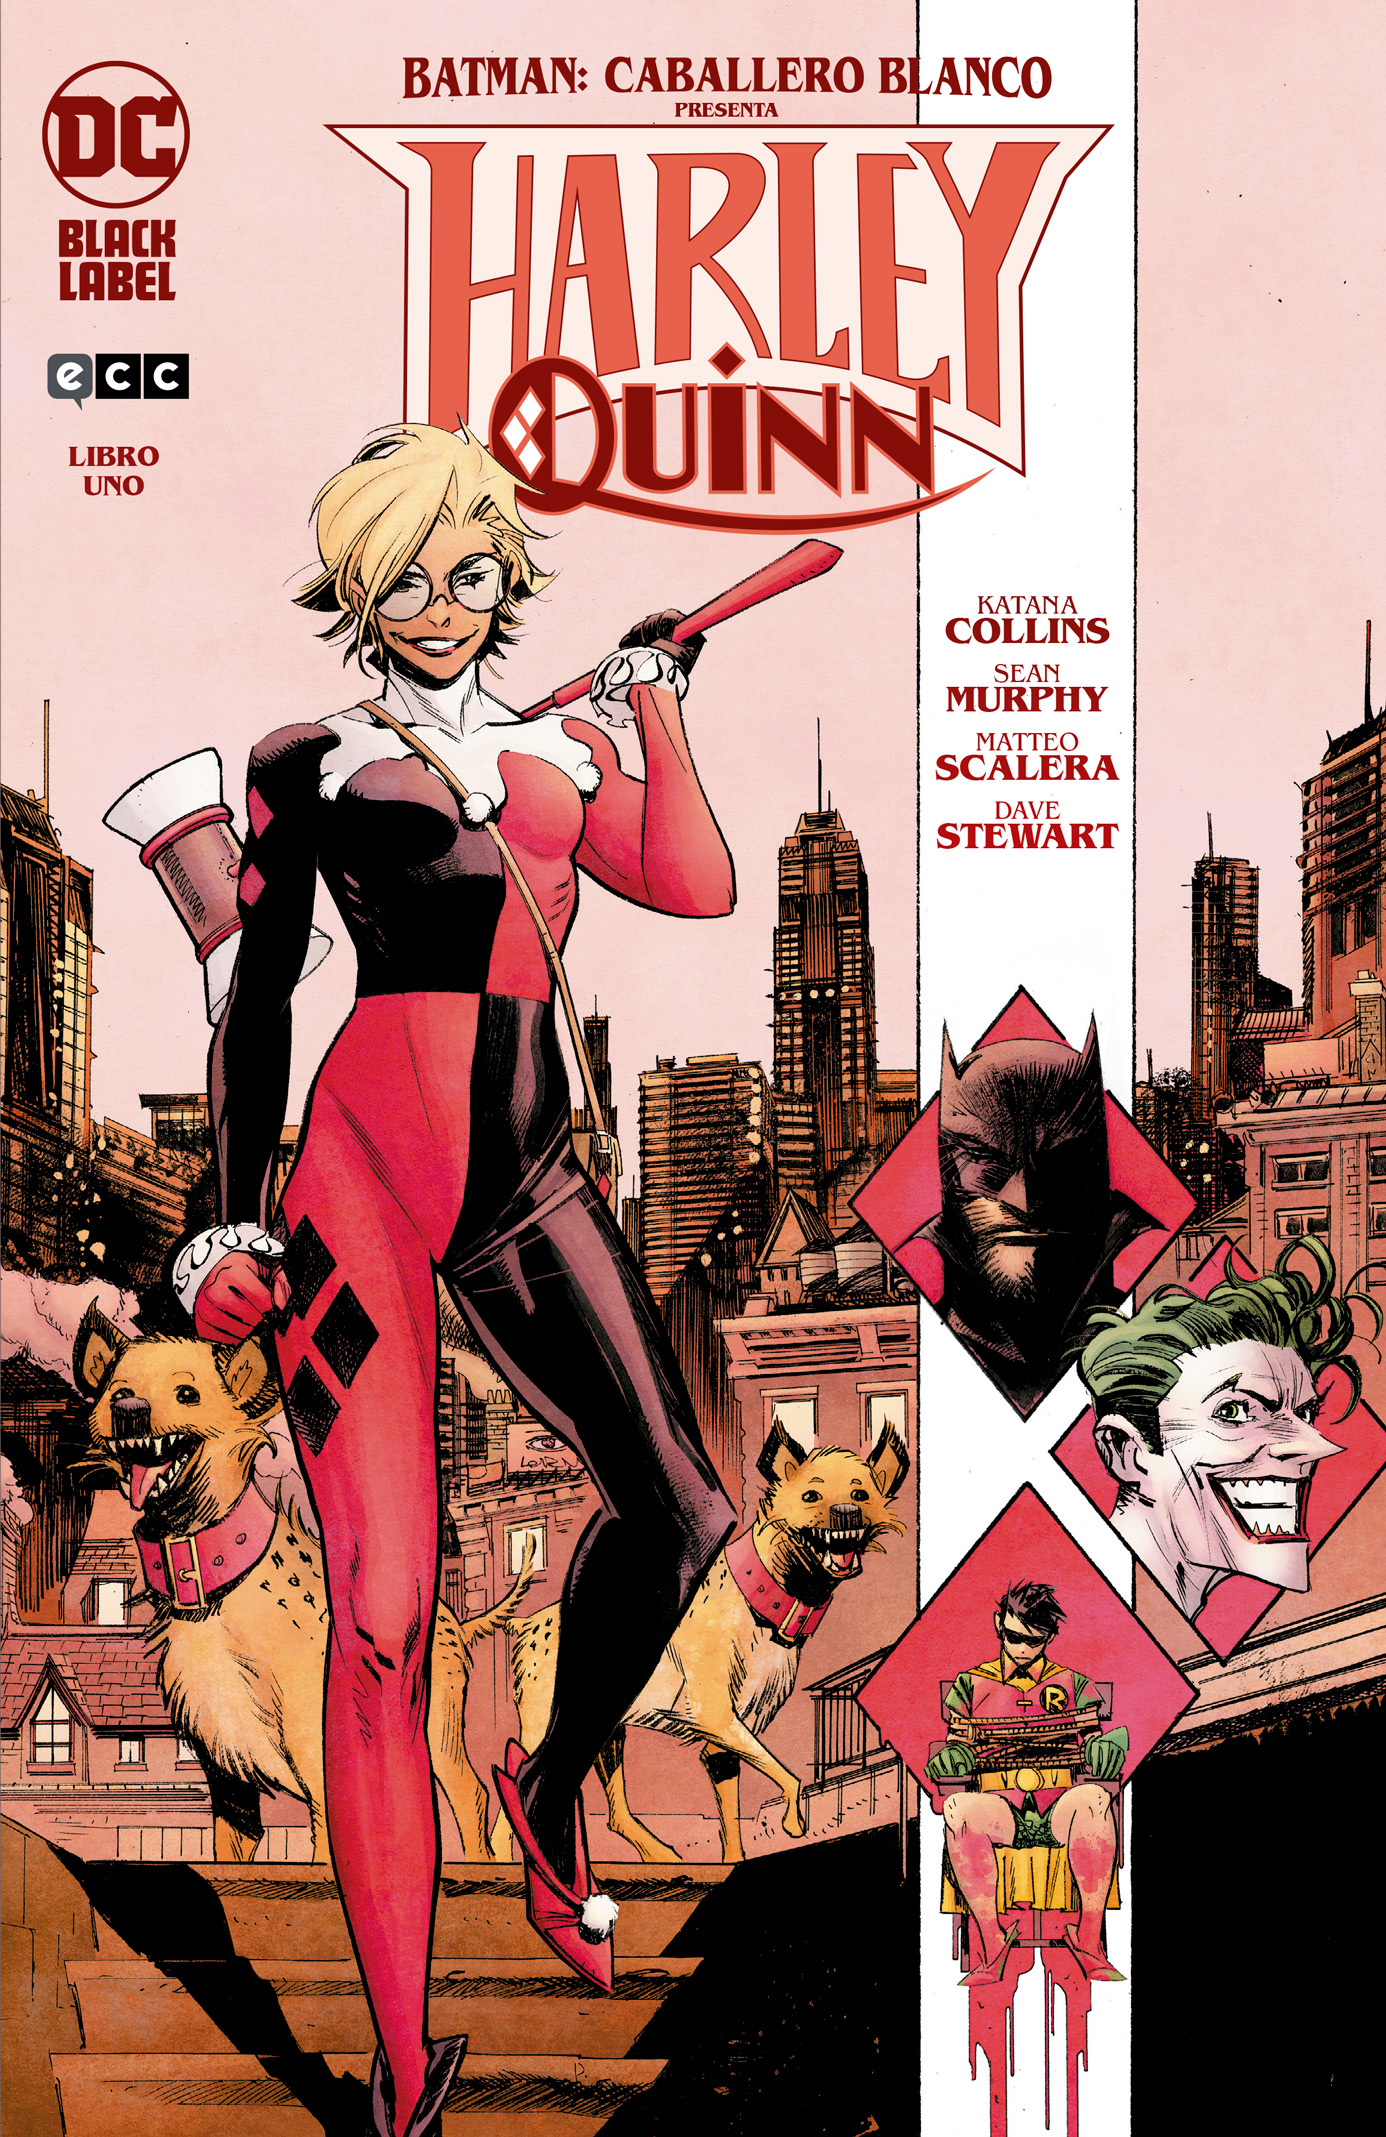 Batman - Caballero Blanco presenta: Harley Quinn núm. 1 de